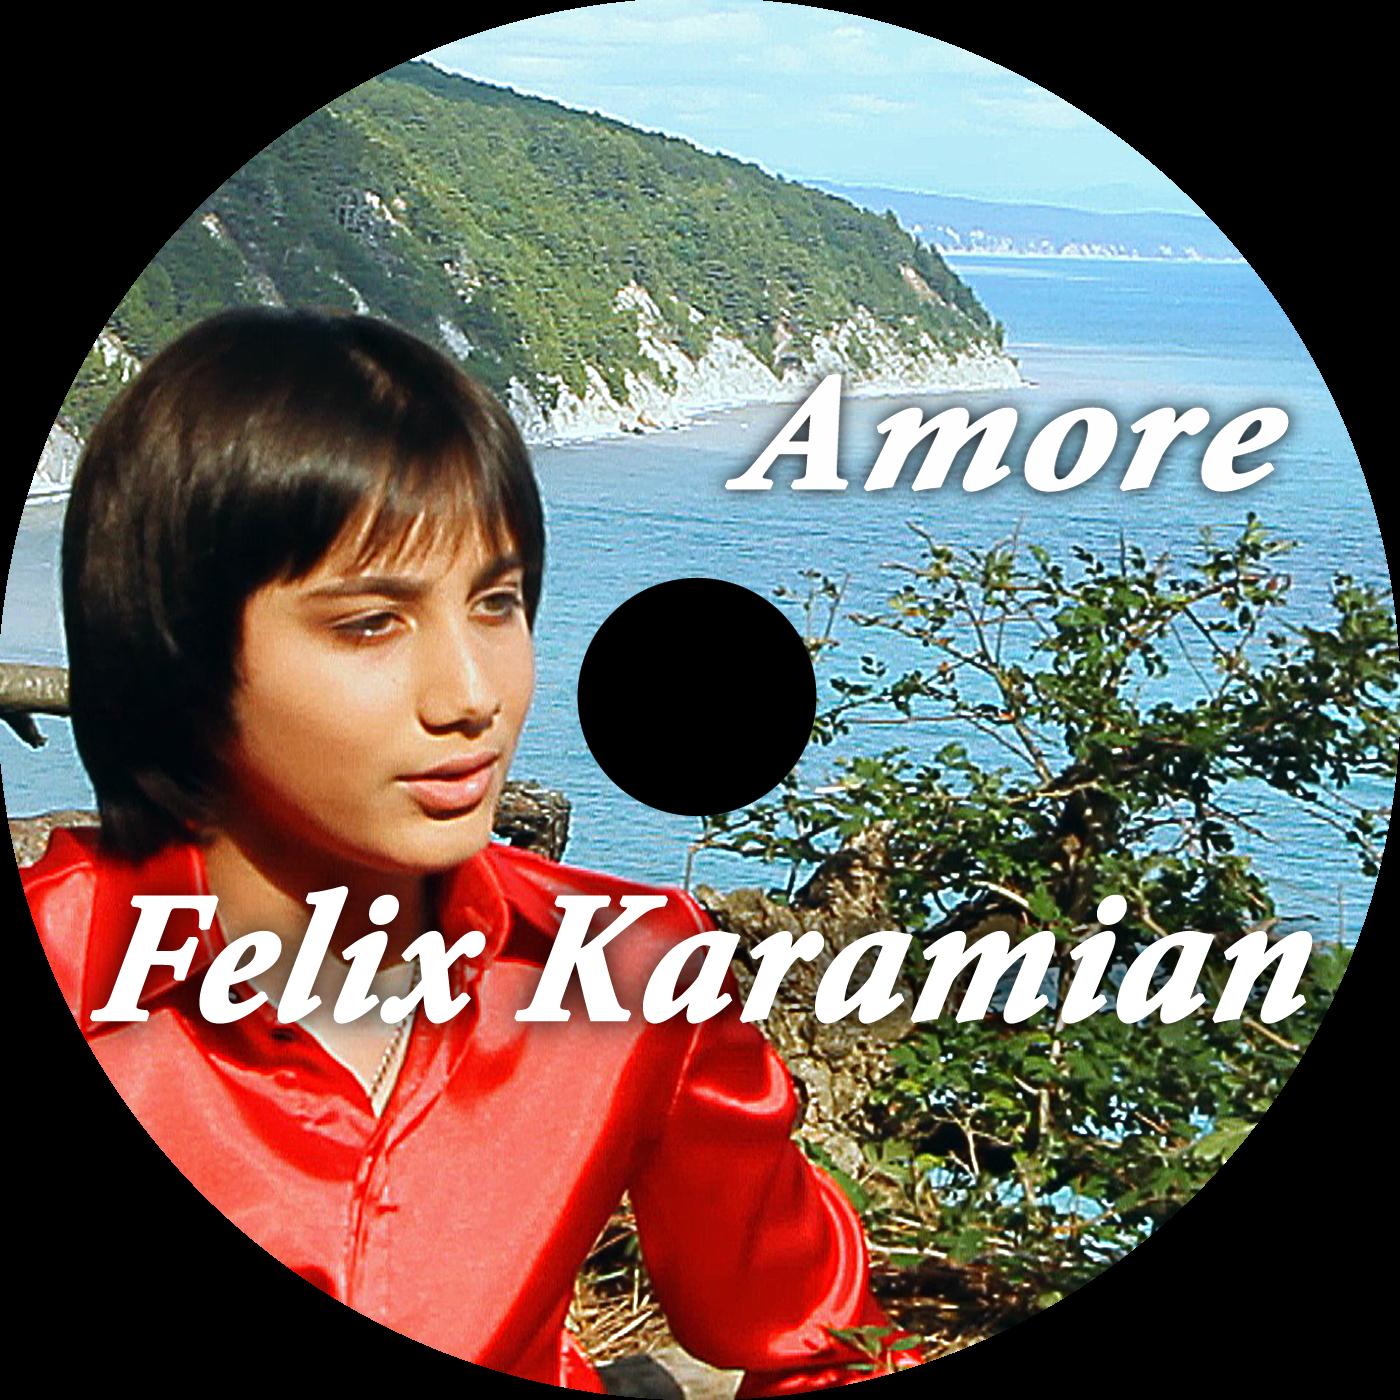 Felix Karamian, video AMORE.jpg